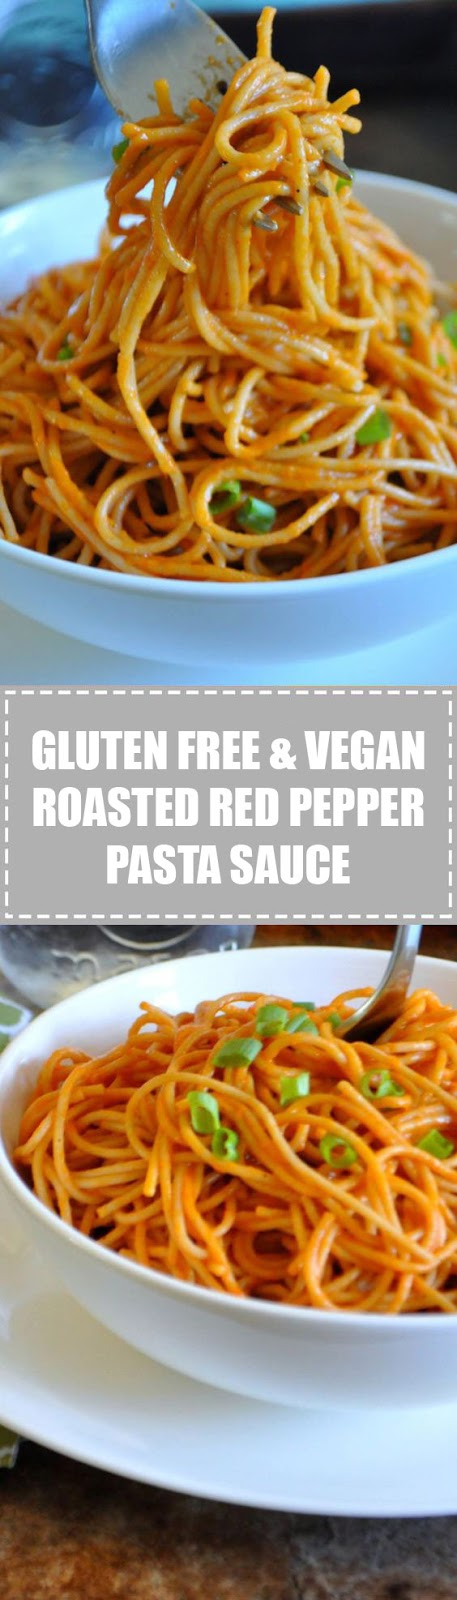 Gluten Free & Vegan Roasted Red Pepper Pasta Sauce